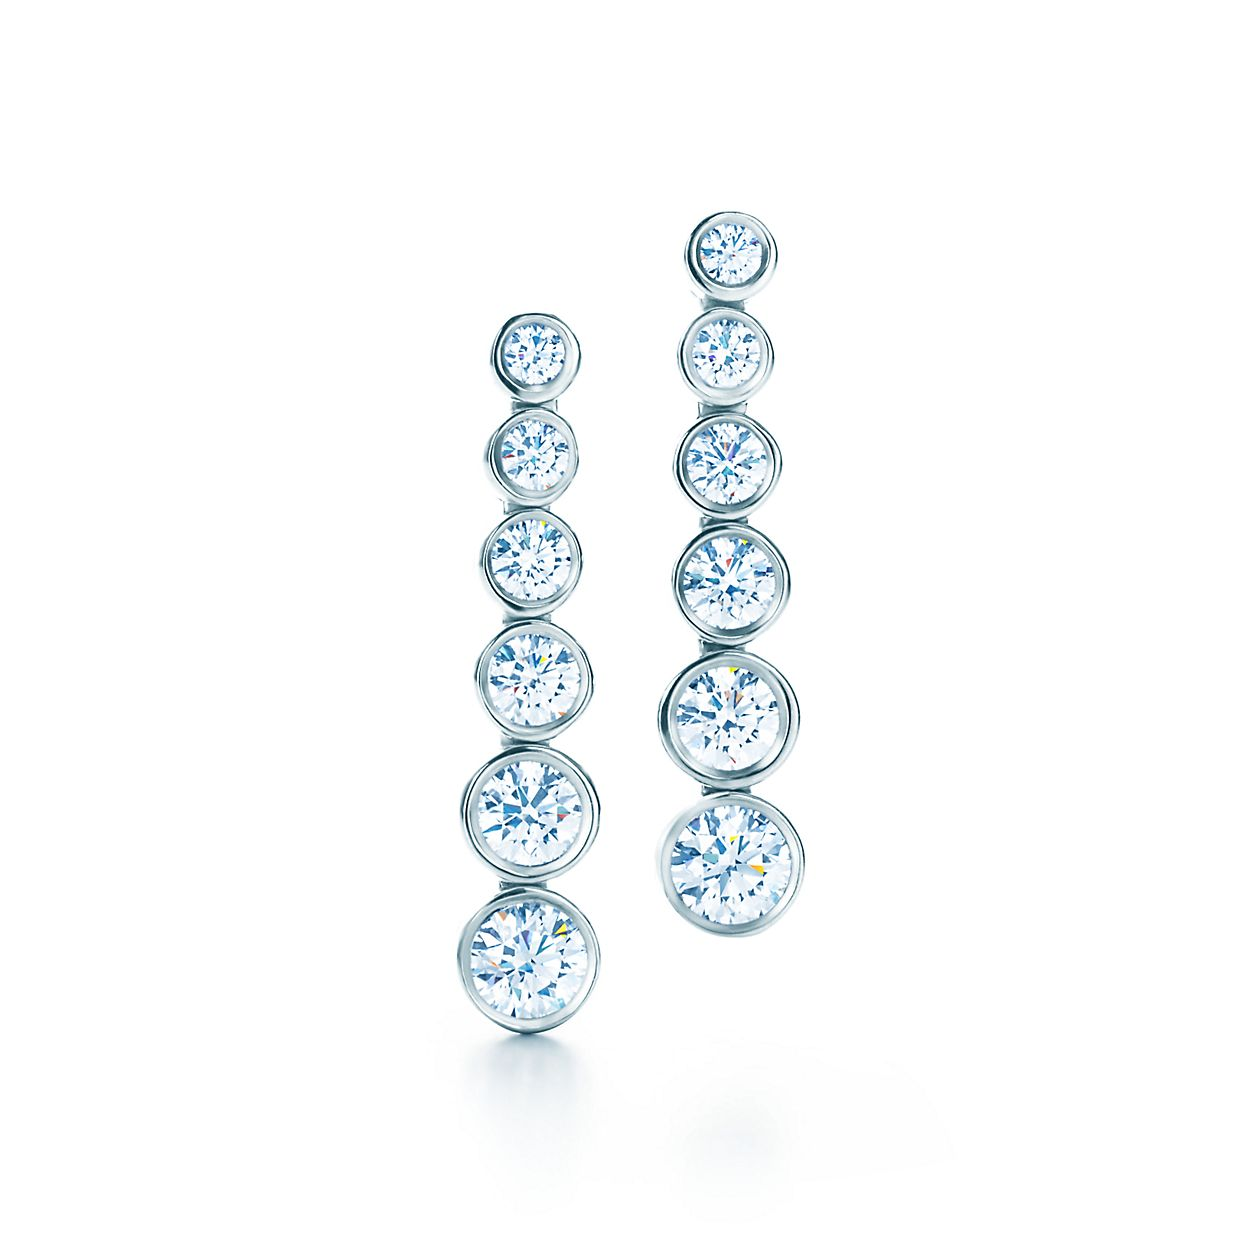 Tiffany Jazz Graduated Drop Earrings